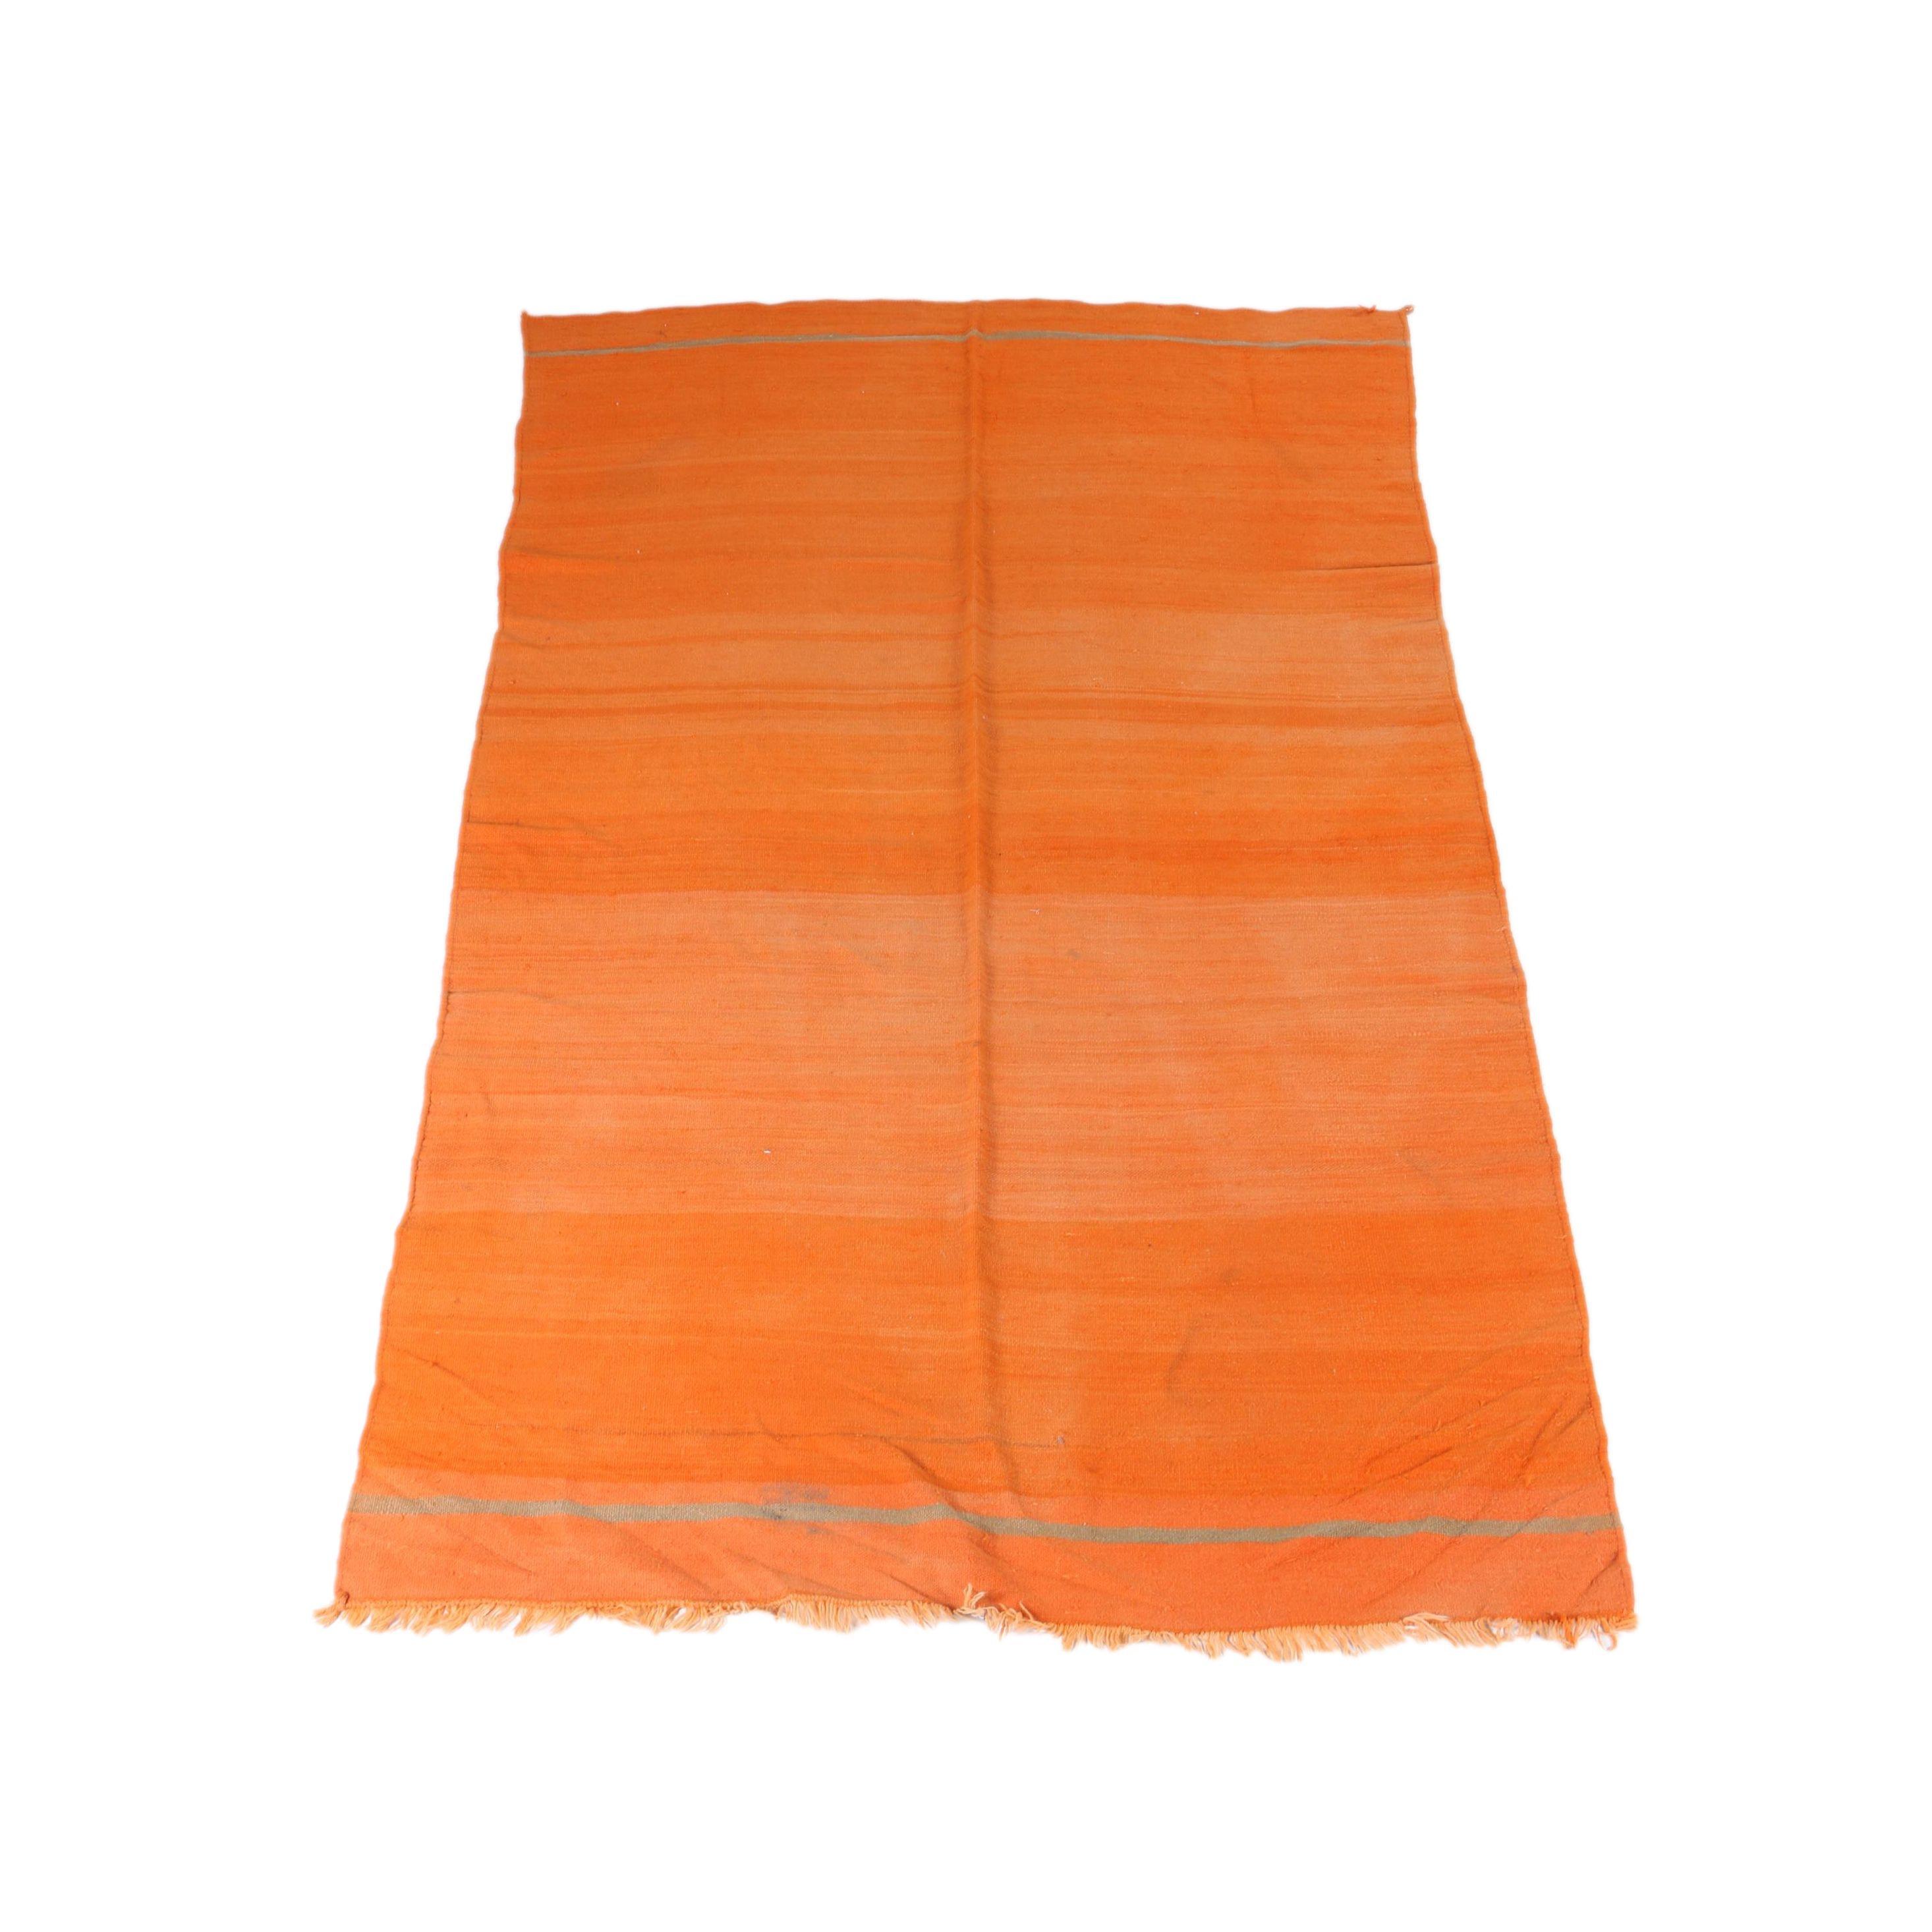 Handwoven Berber Blanket or Rug